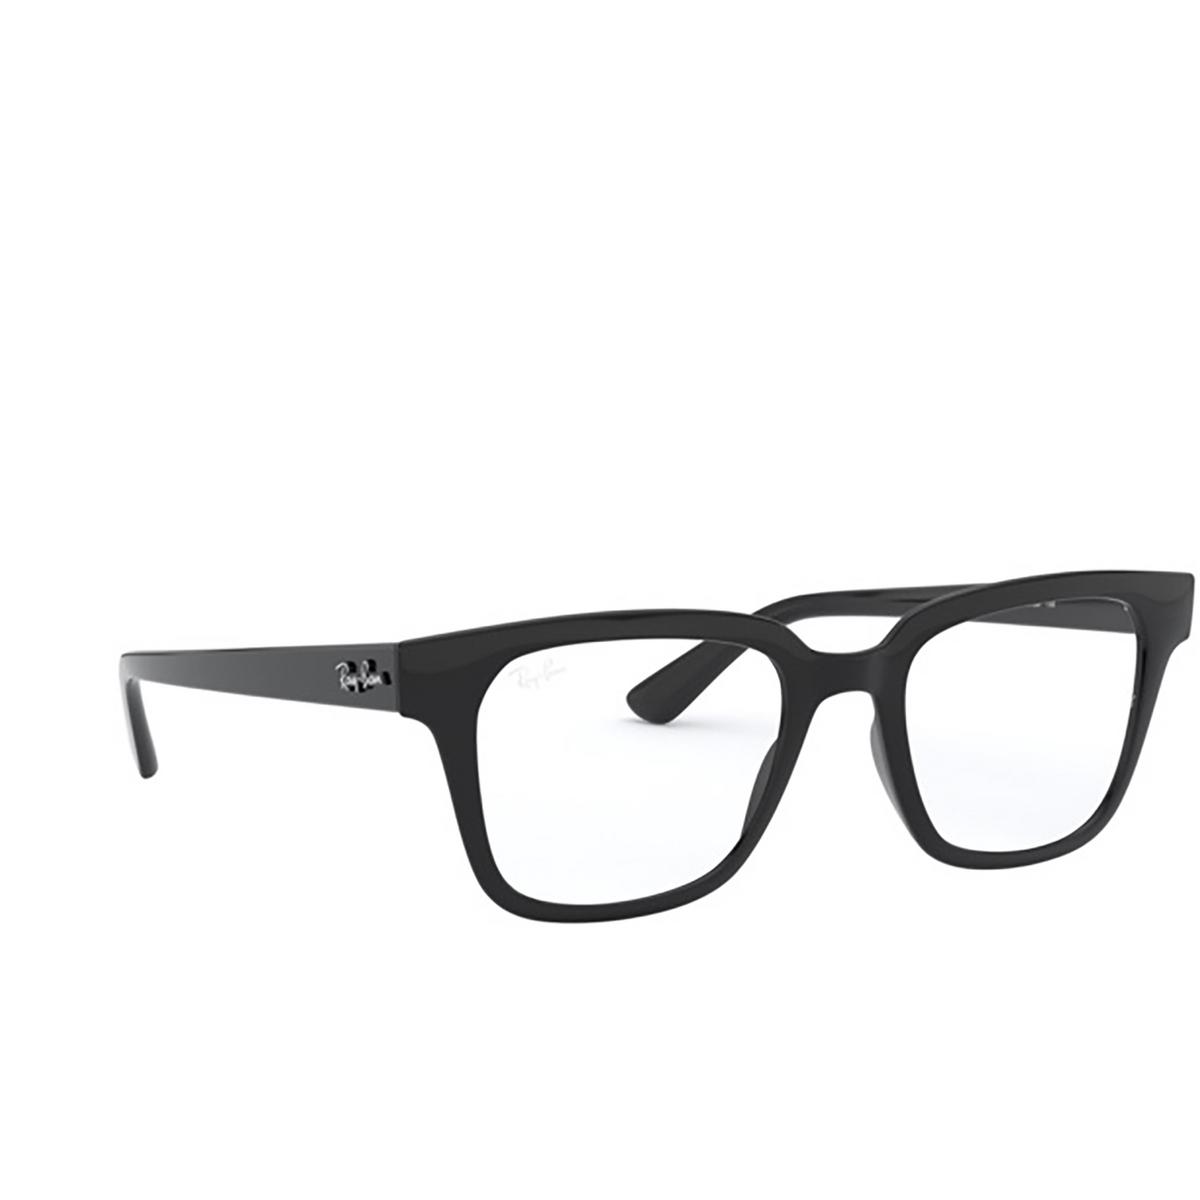 Ray-Ban® Square Eyeglasses: RX4323V color Black 2000.